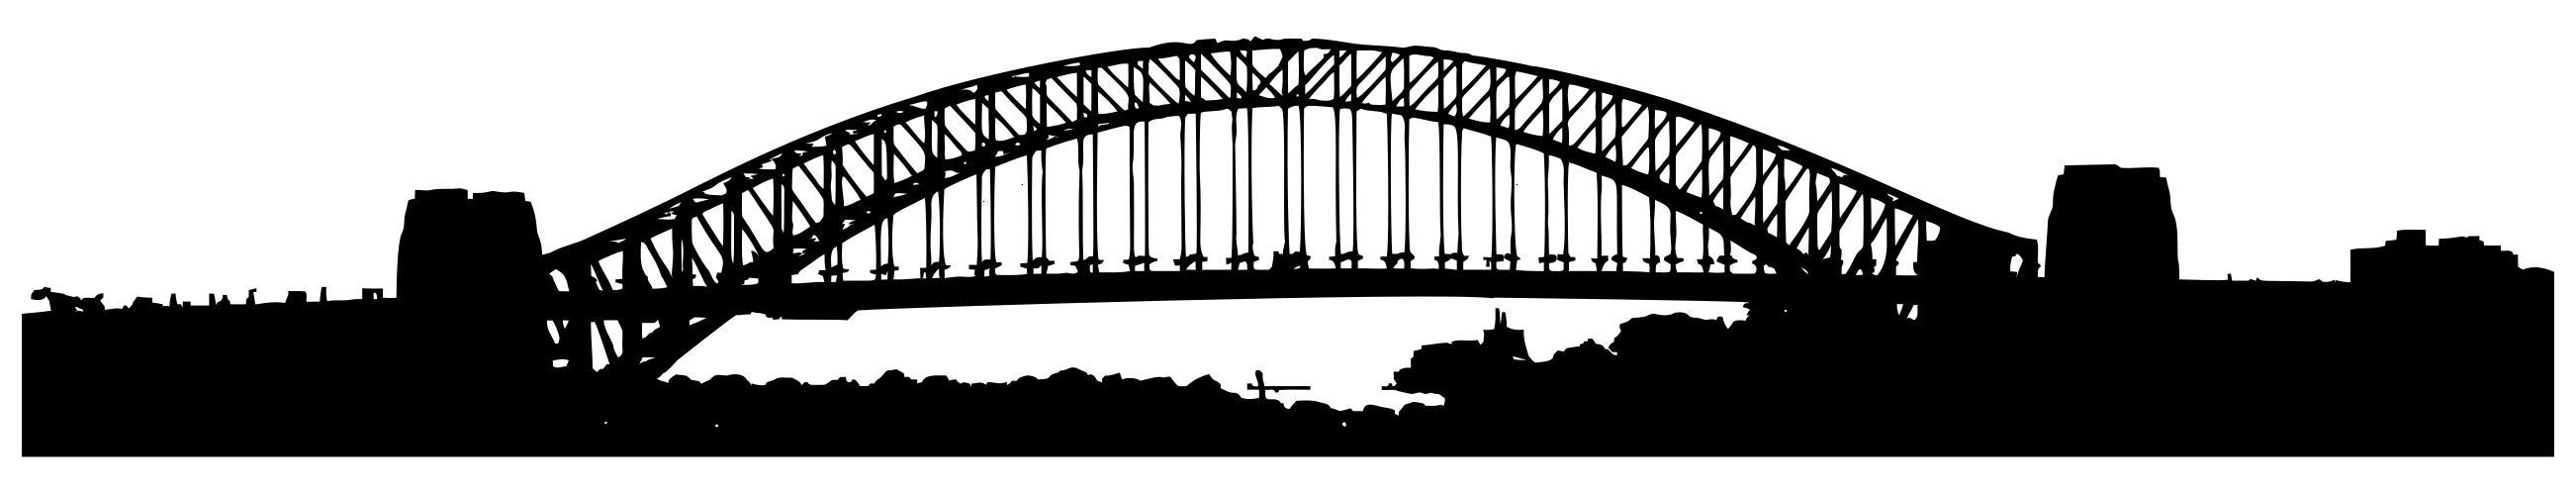 Sydney harbor design droide. Bridge clipart silhouette